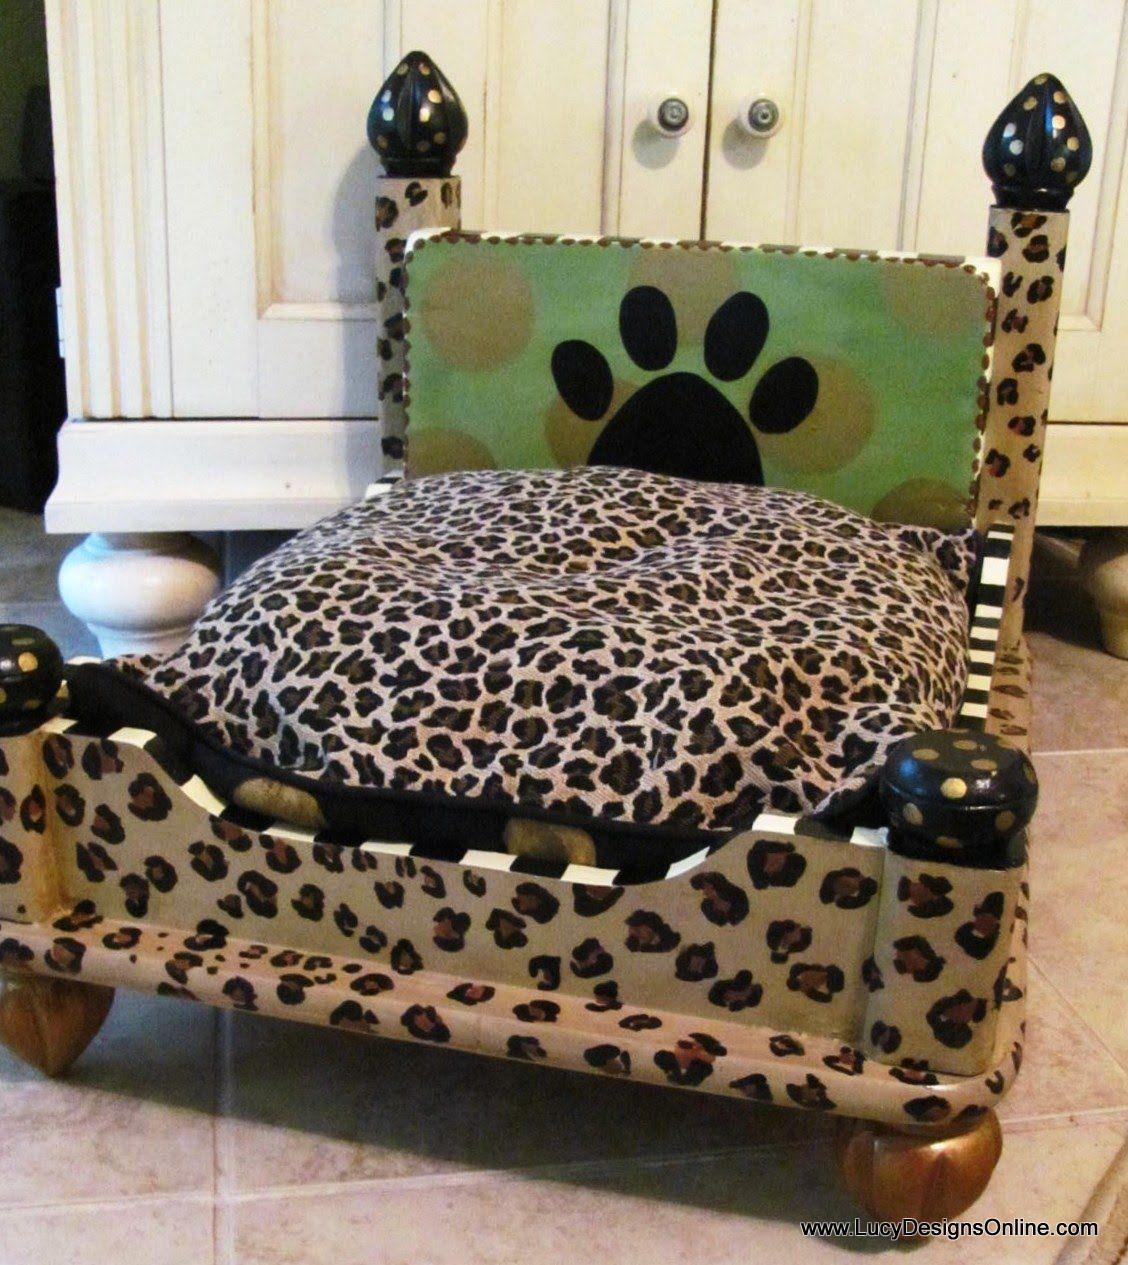 Giraffe Print Chair Ergonomic Petite Leopard Furniture Images Animal